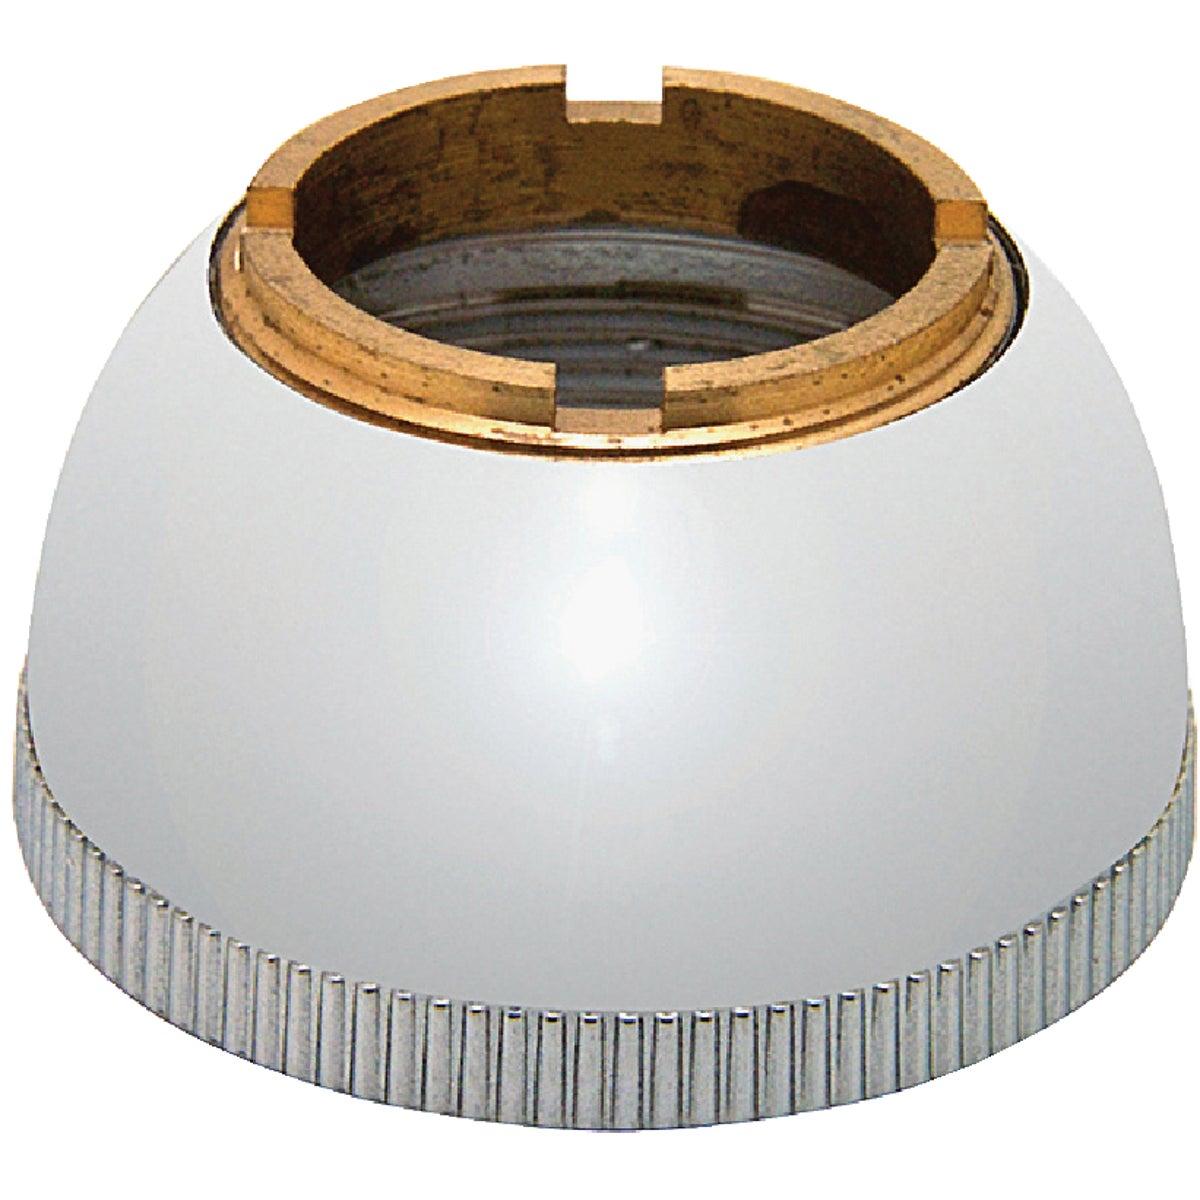 DELTA FAUCET CAP - 88756 by Danco Perfect Match